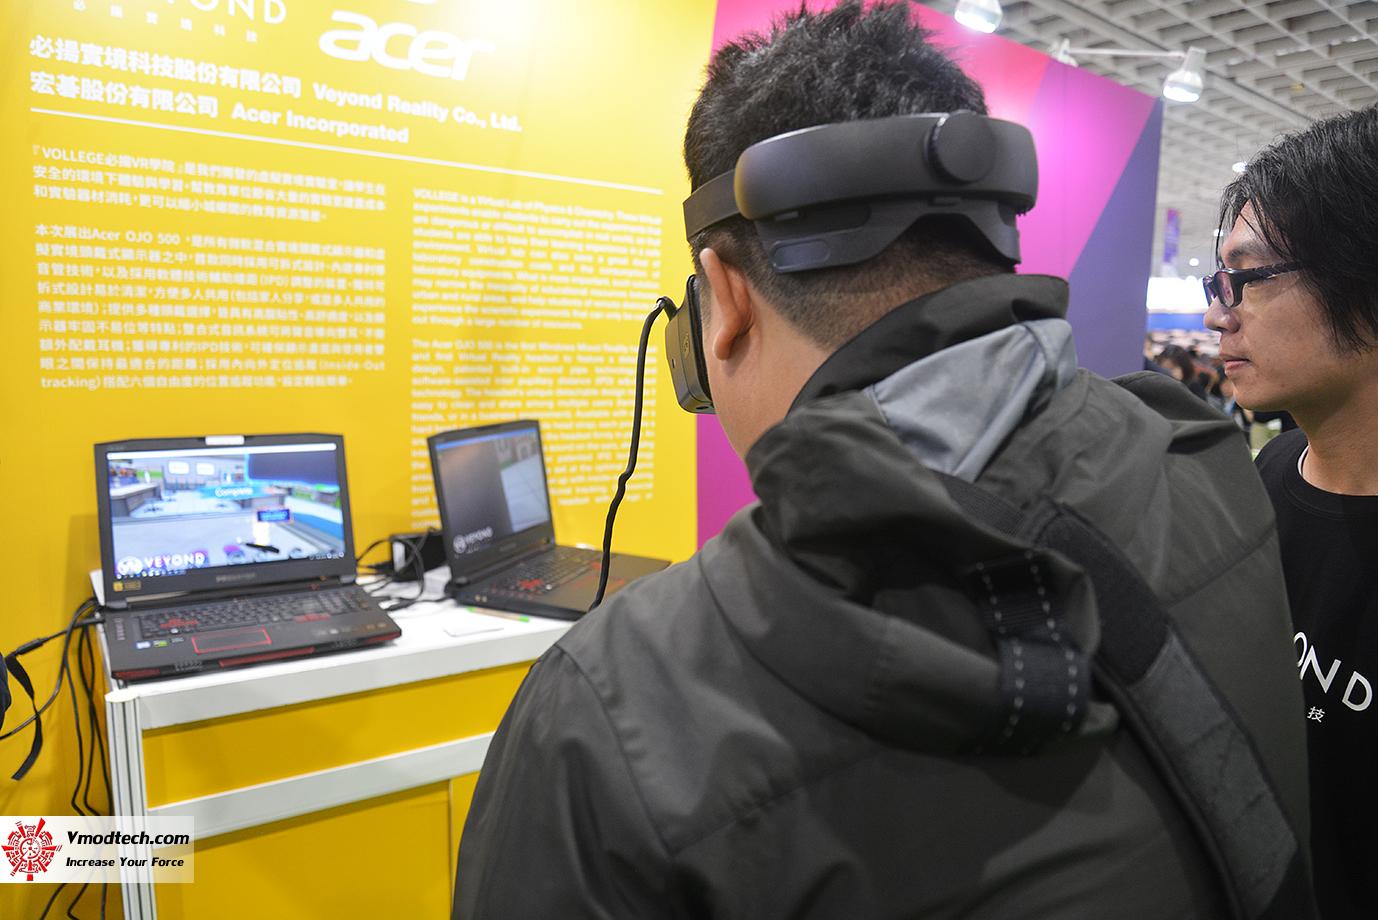 dsc 8608 เยี่ยมชมบูธ Smart Education ระบบการศึกษาอัจฉริยะในงาน 2019 SMART CITY SUMMIT & EXPO ณ กรุงไทเป ประเทศไต้หวัน